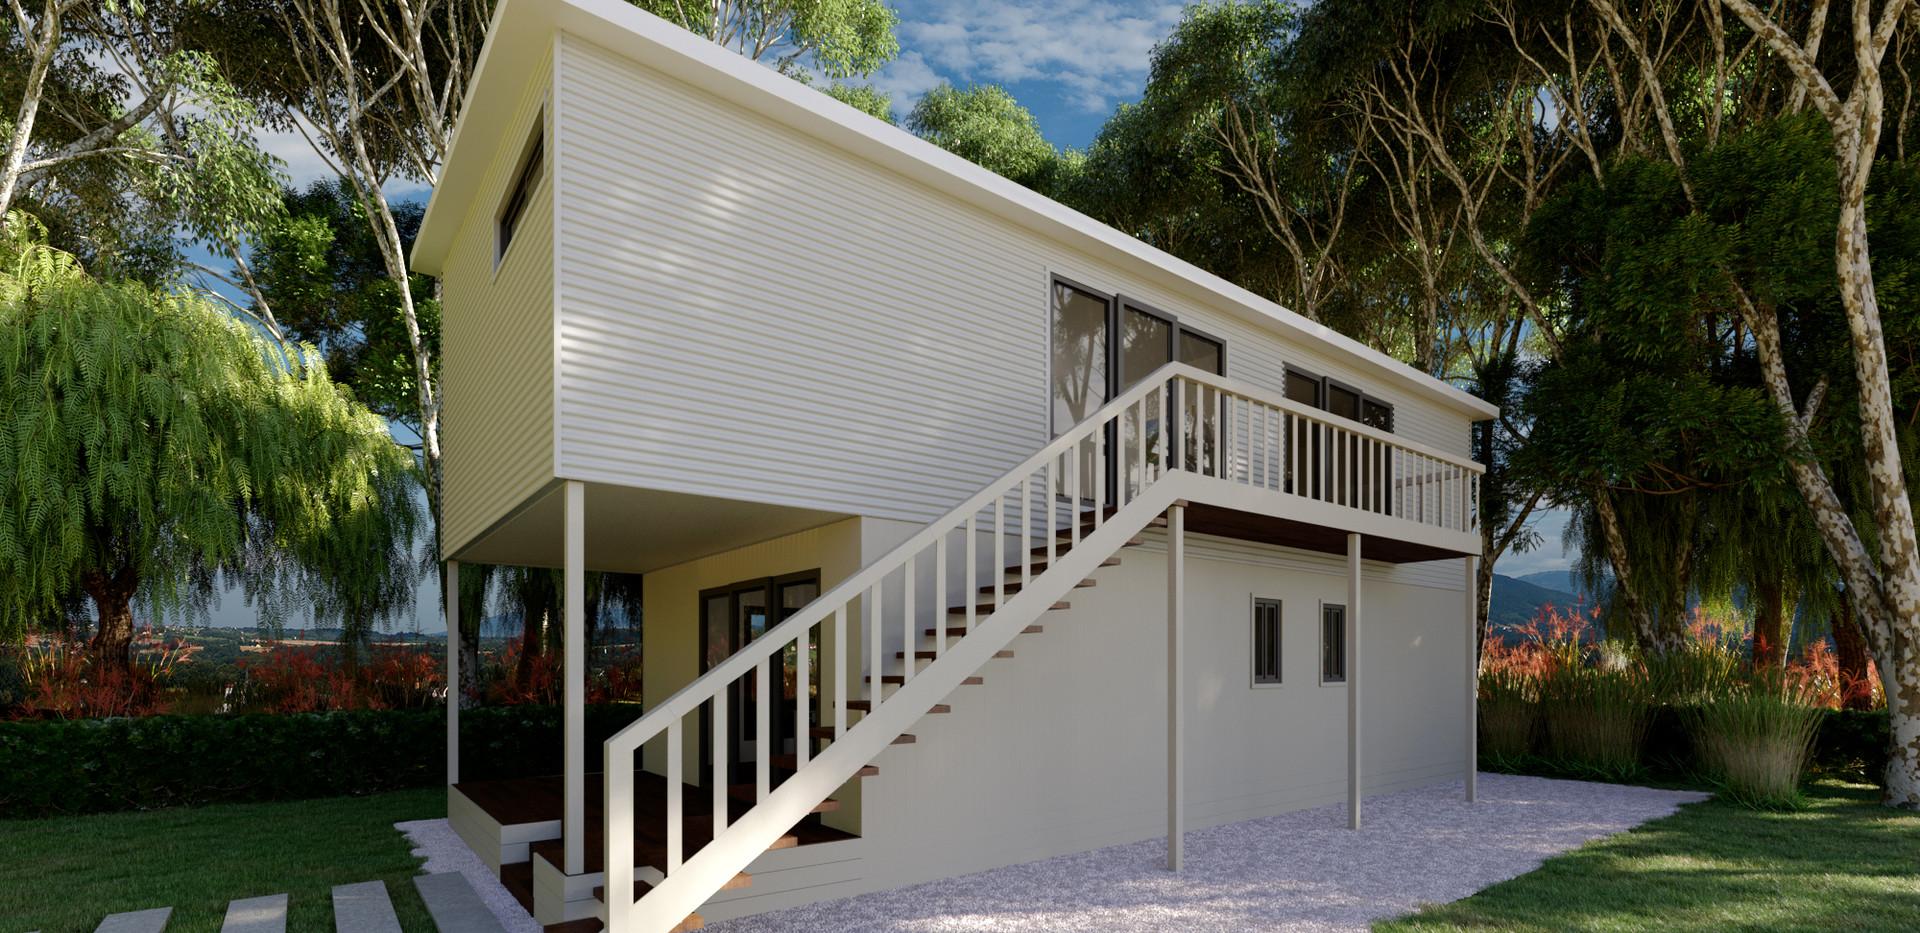 Luda Studios_Vic_Zale Holiday homes.jpg